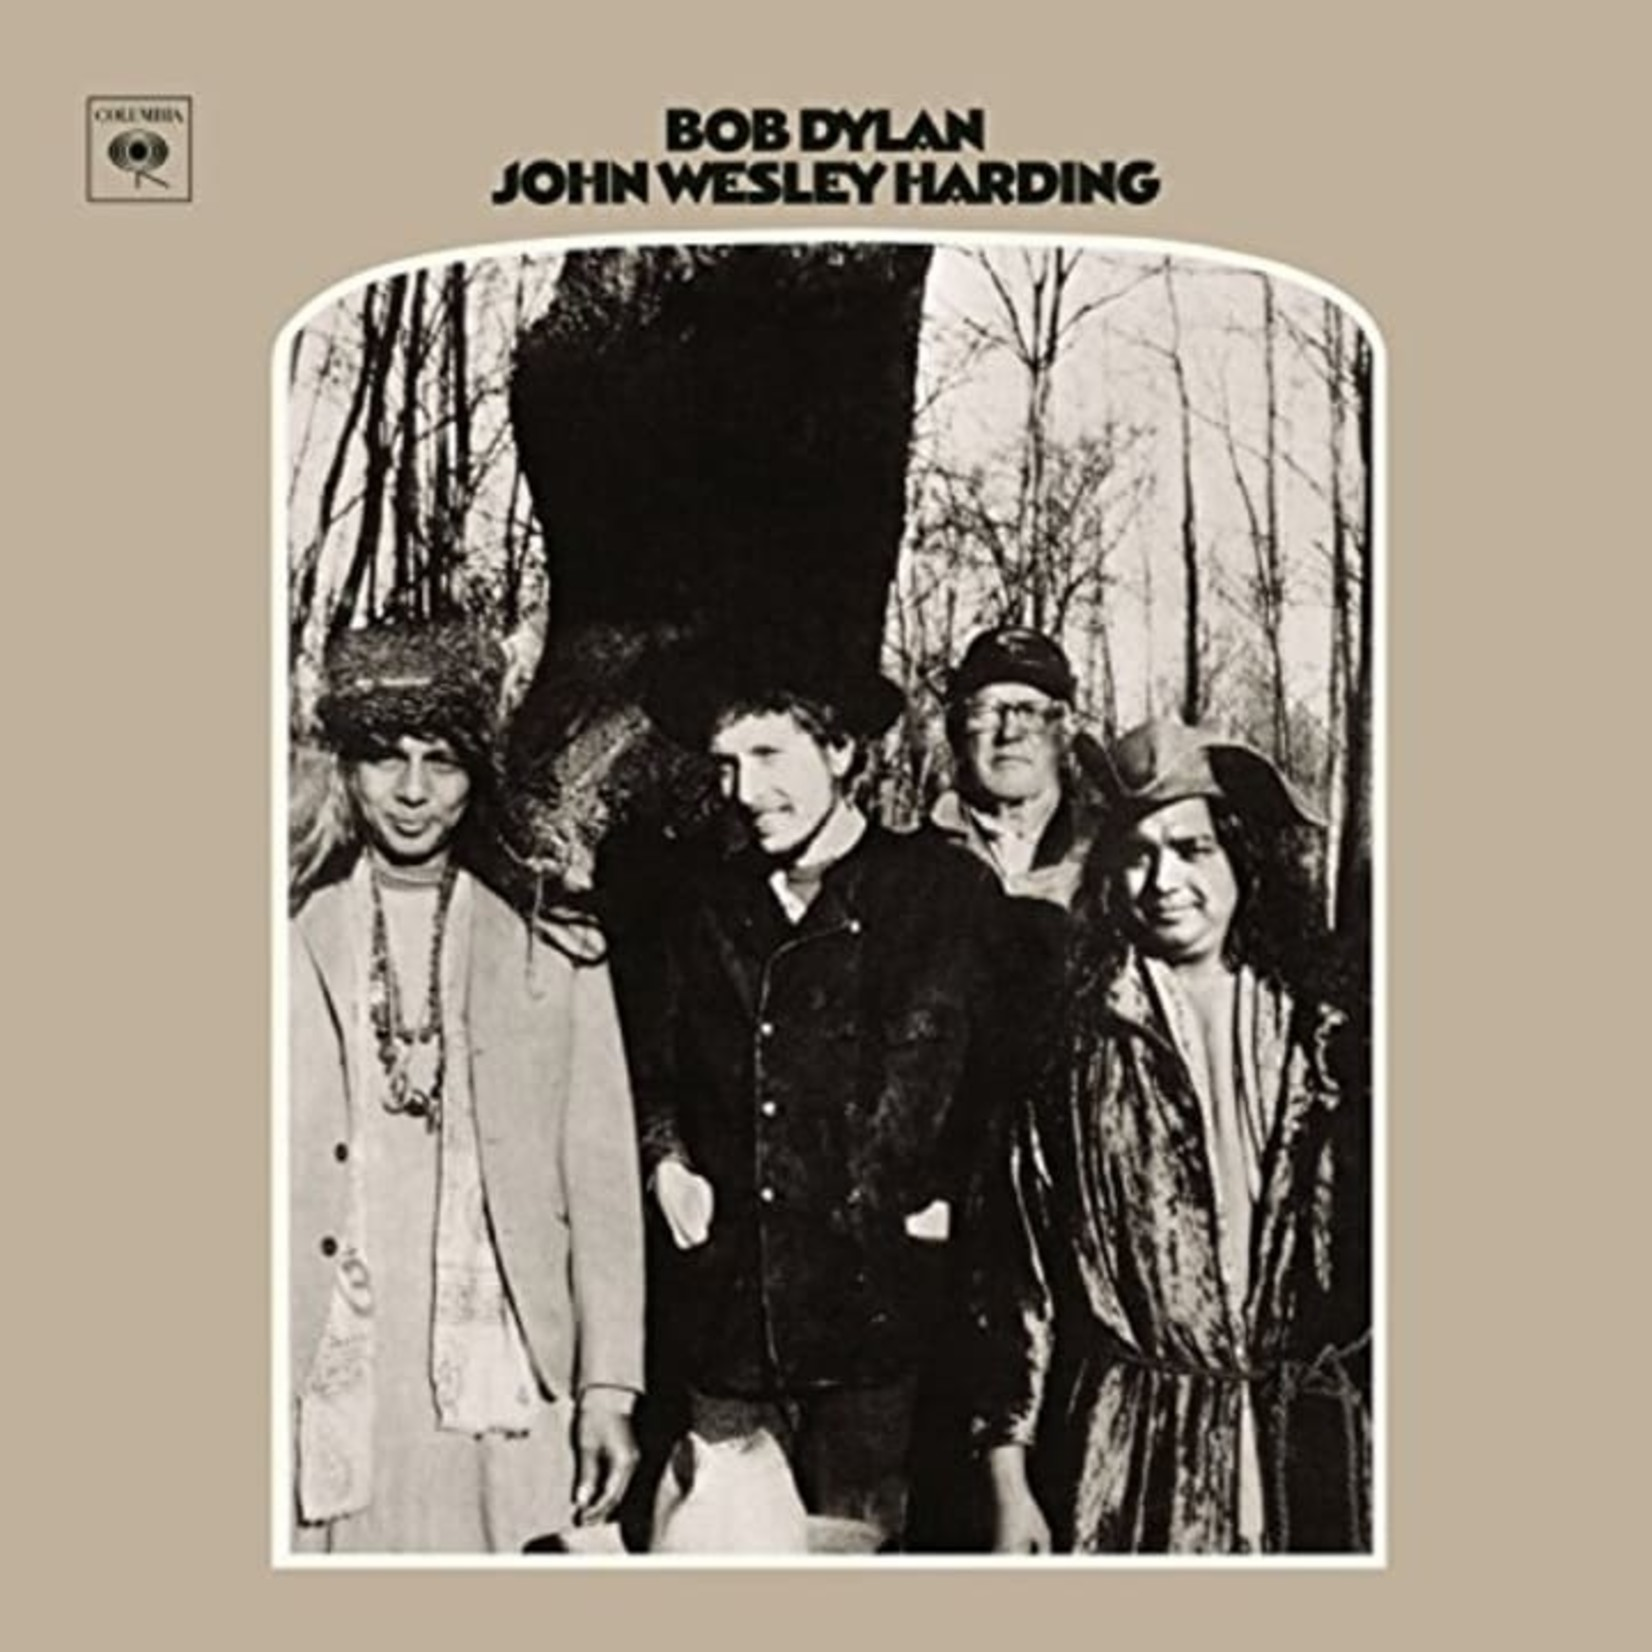 Vinyl Bob Dylan - John Wesley Harding